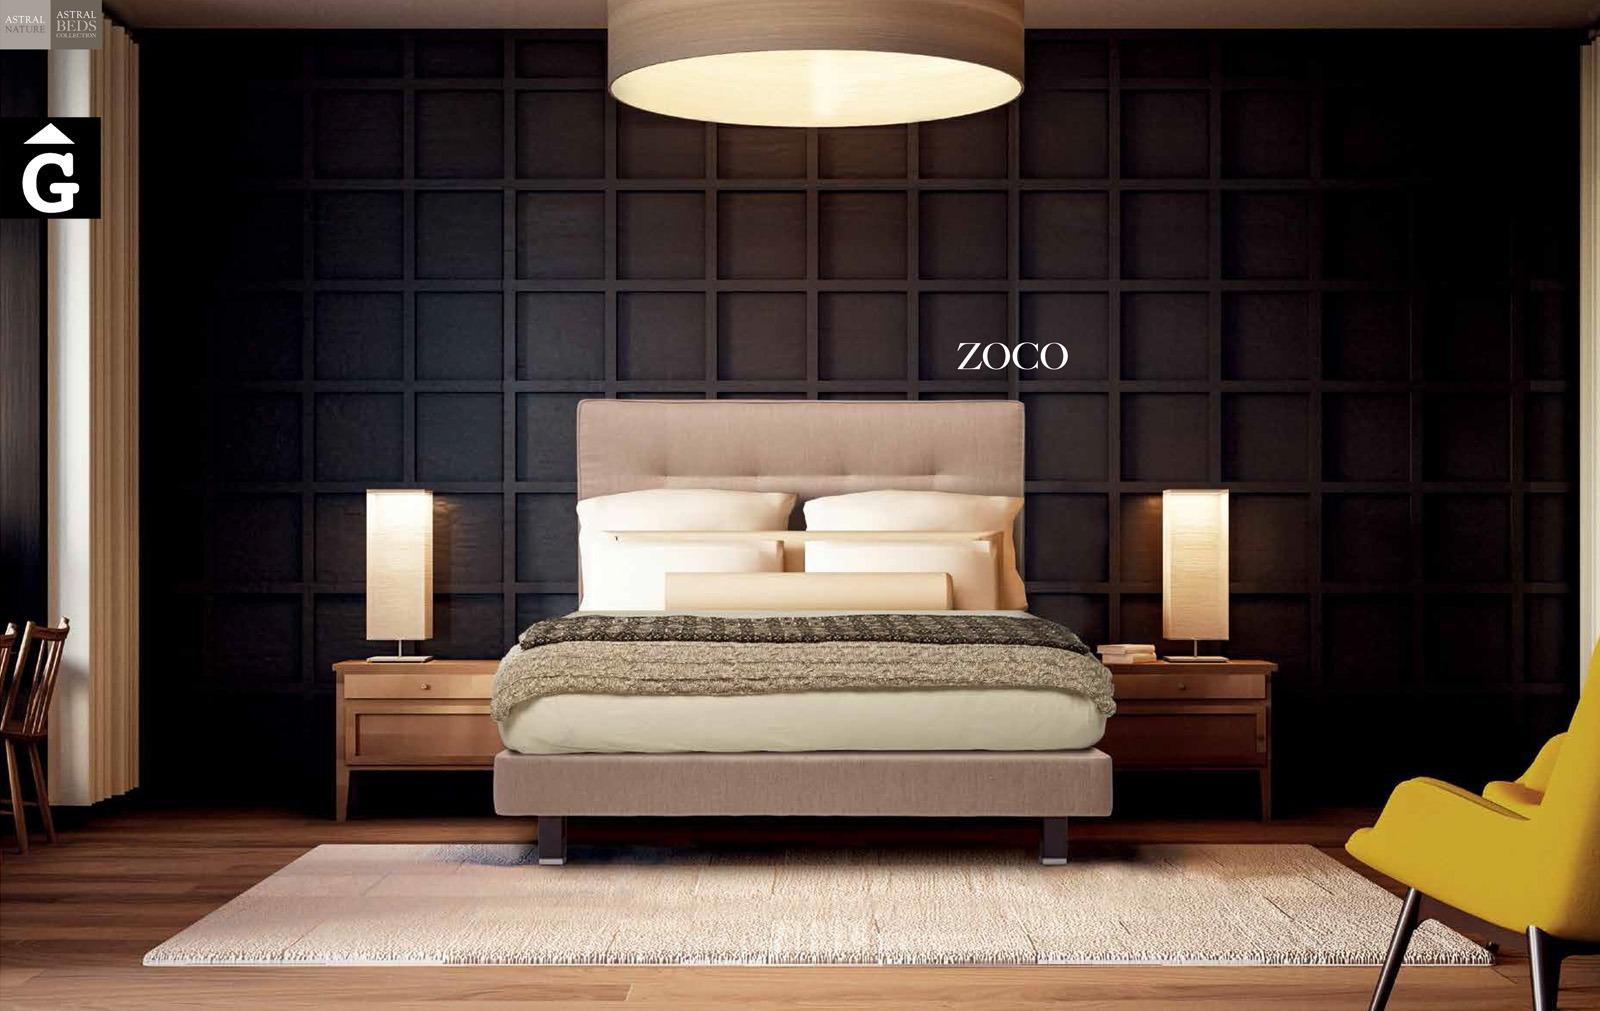 Zoco llit entapissat collection Beds Astral Nature descans qualitat natural i salut junts per mobles Gifreu